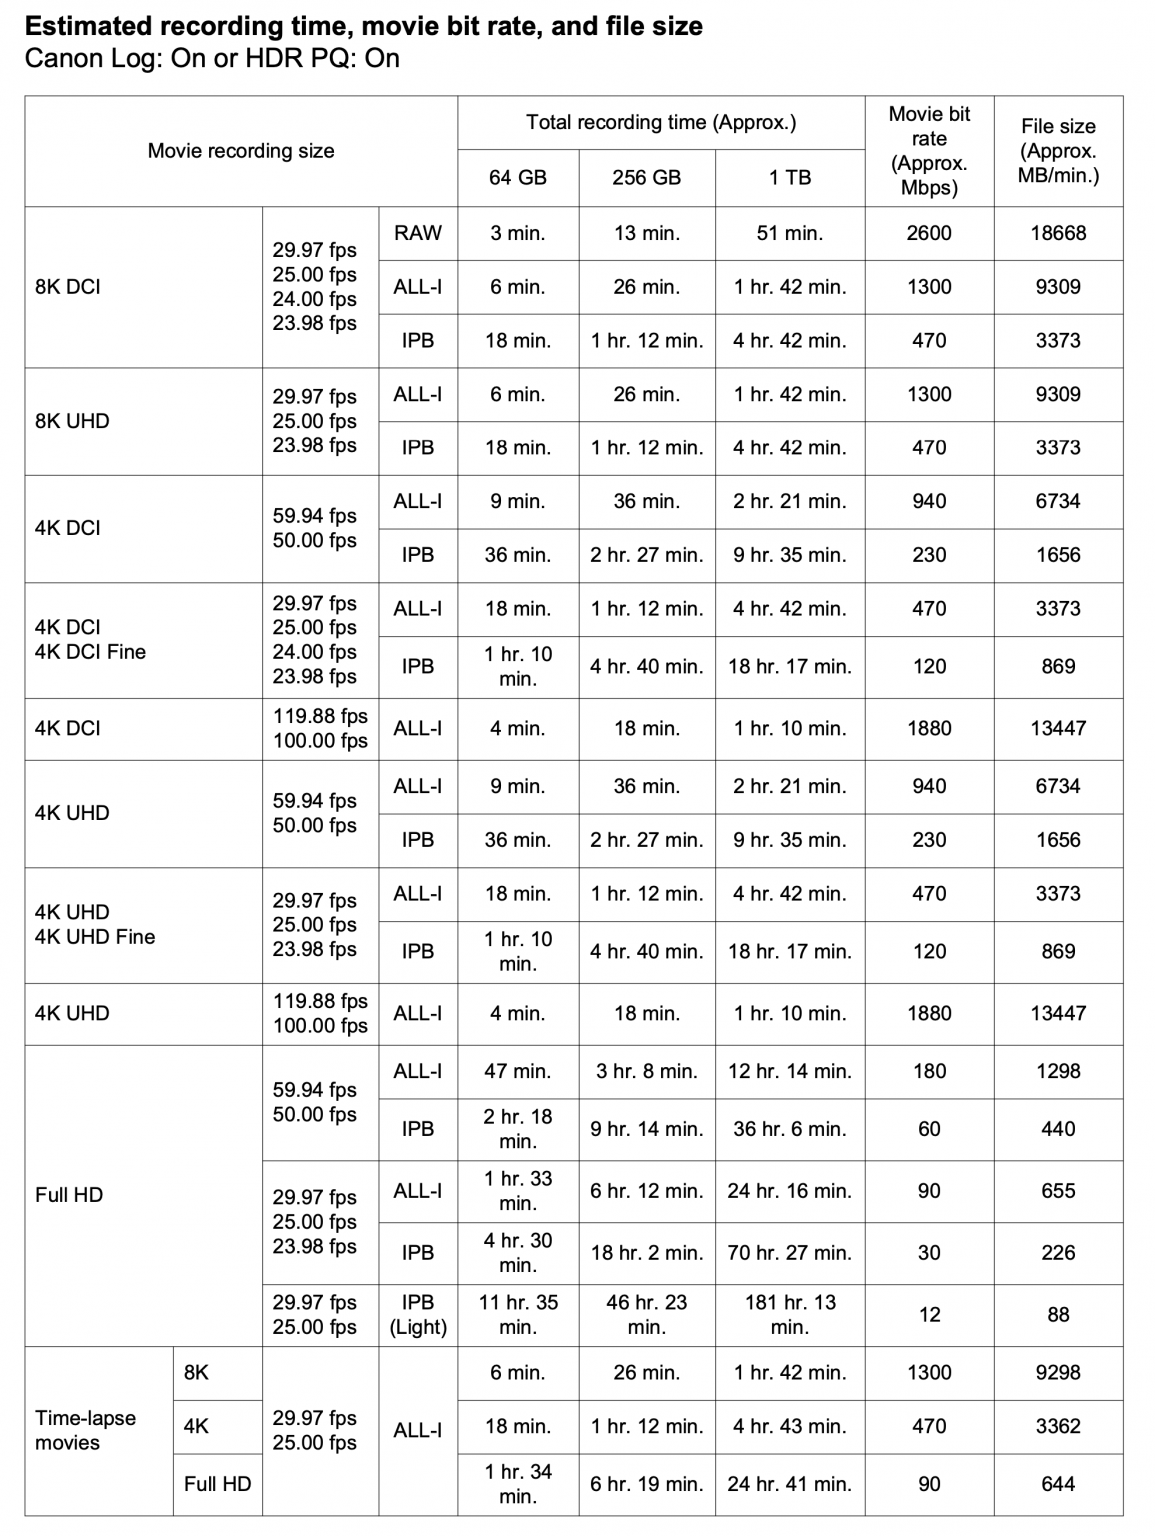 Screenshot-2020-08-02-at-2.43.45-PM-1155×1536